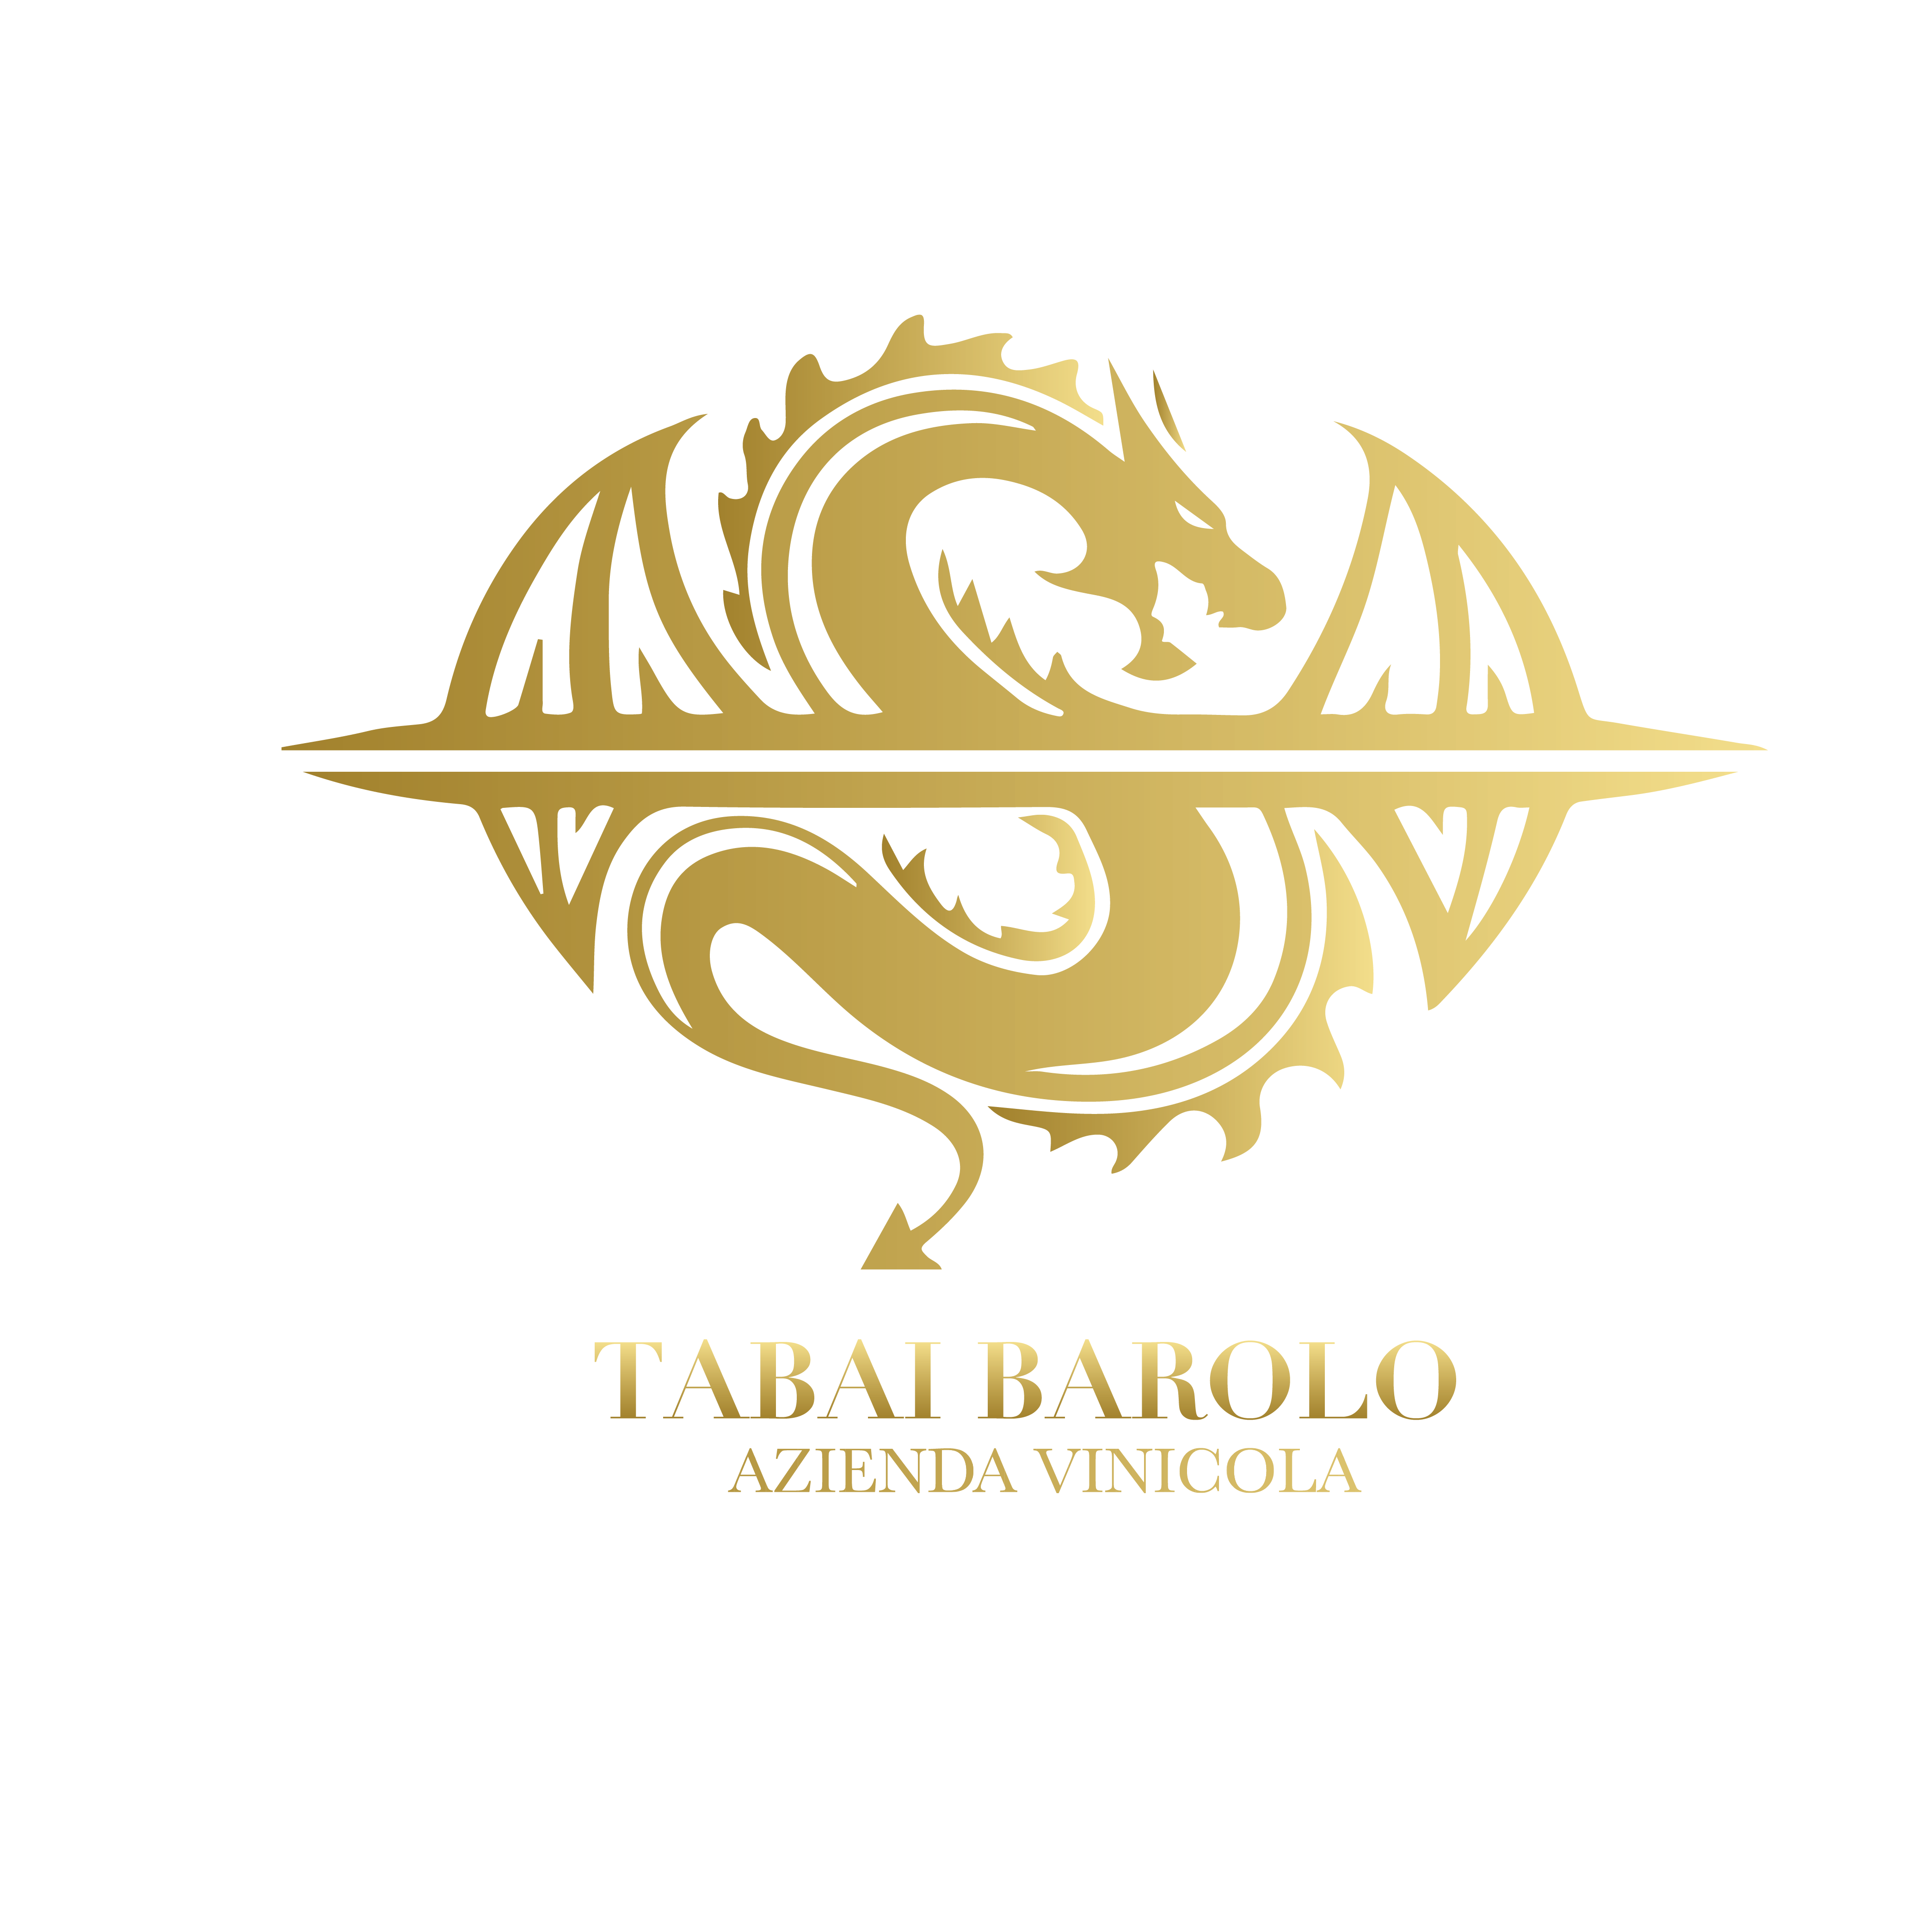 Tabai Barolo